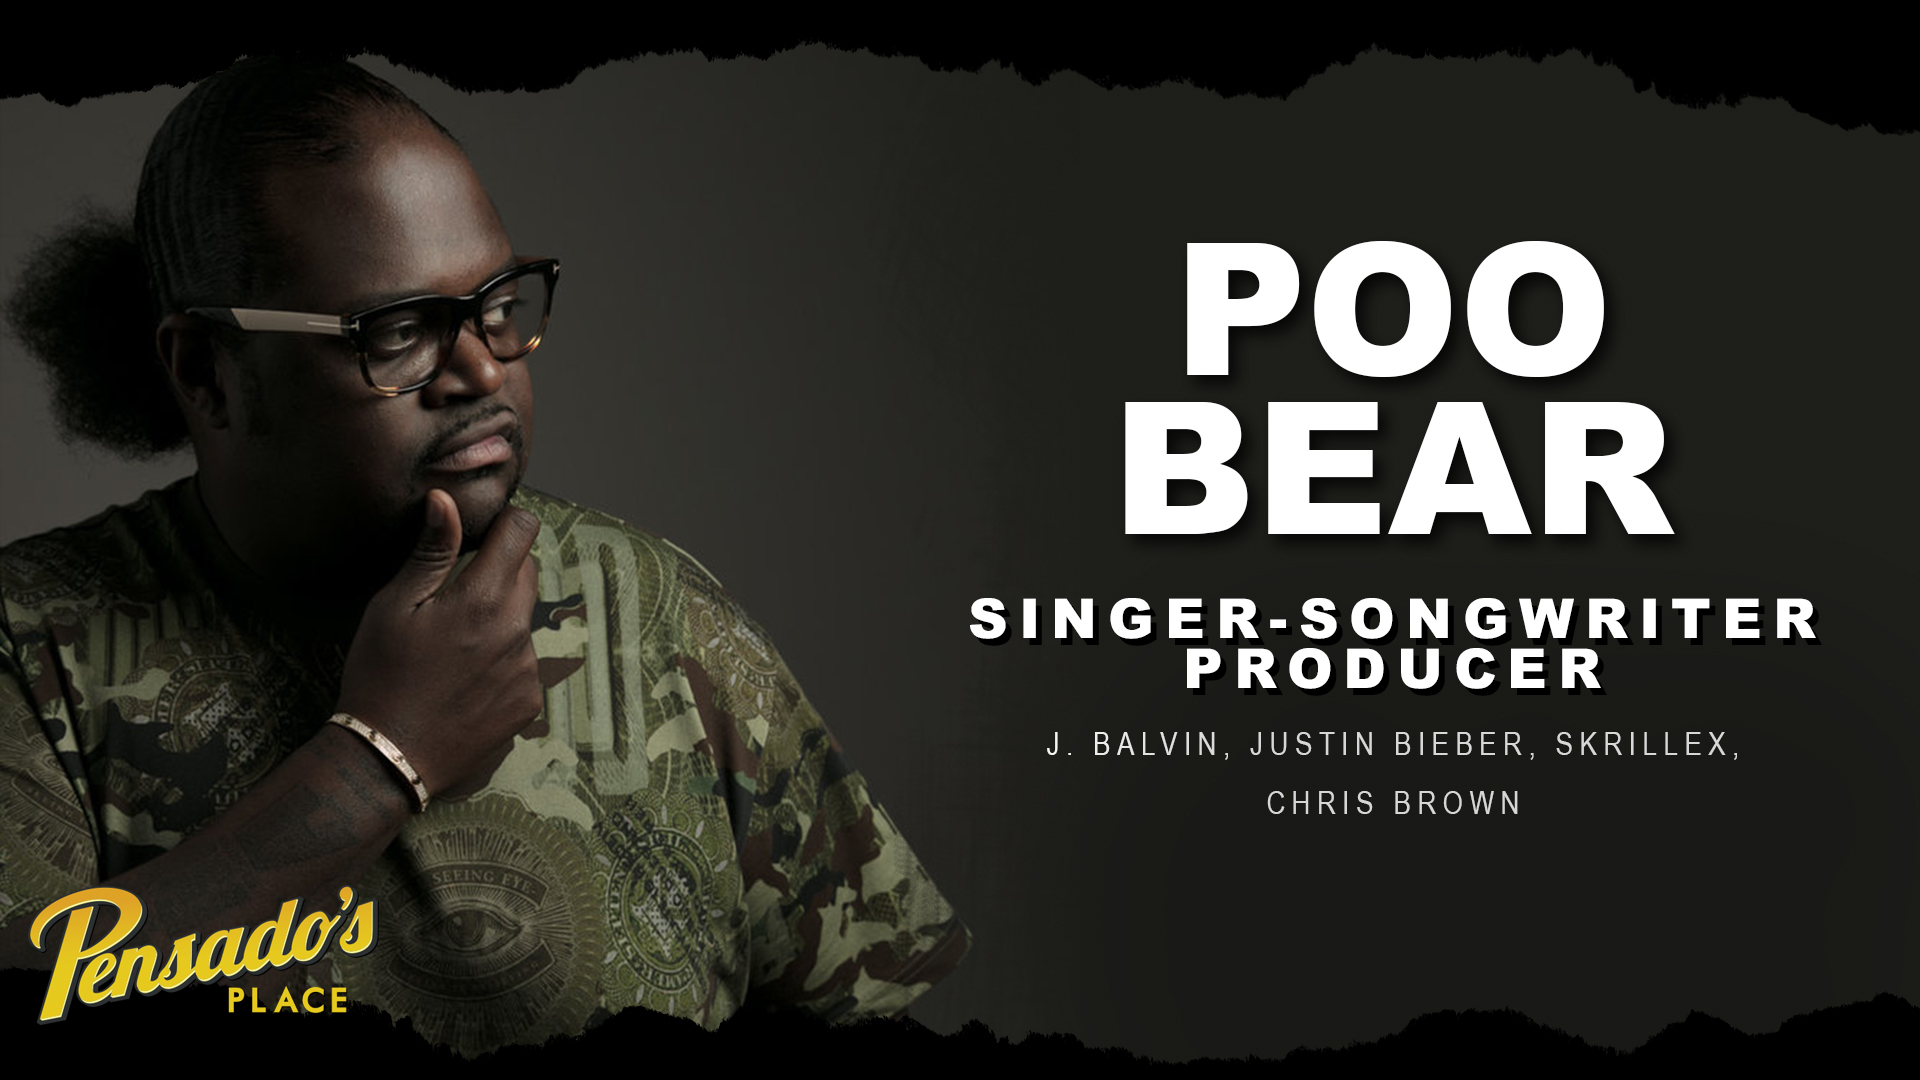 Justin Bieber Songwriter / Producer, Poo Bear